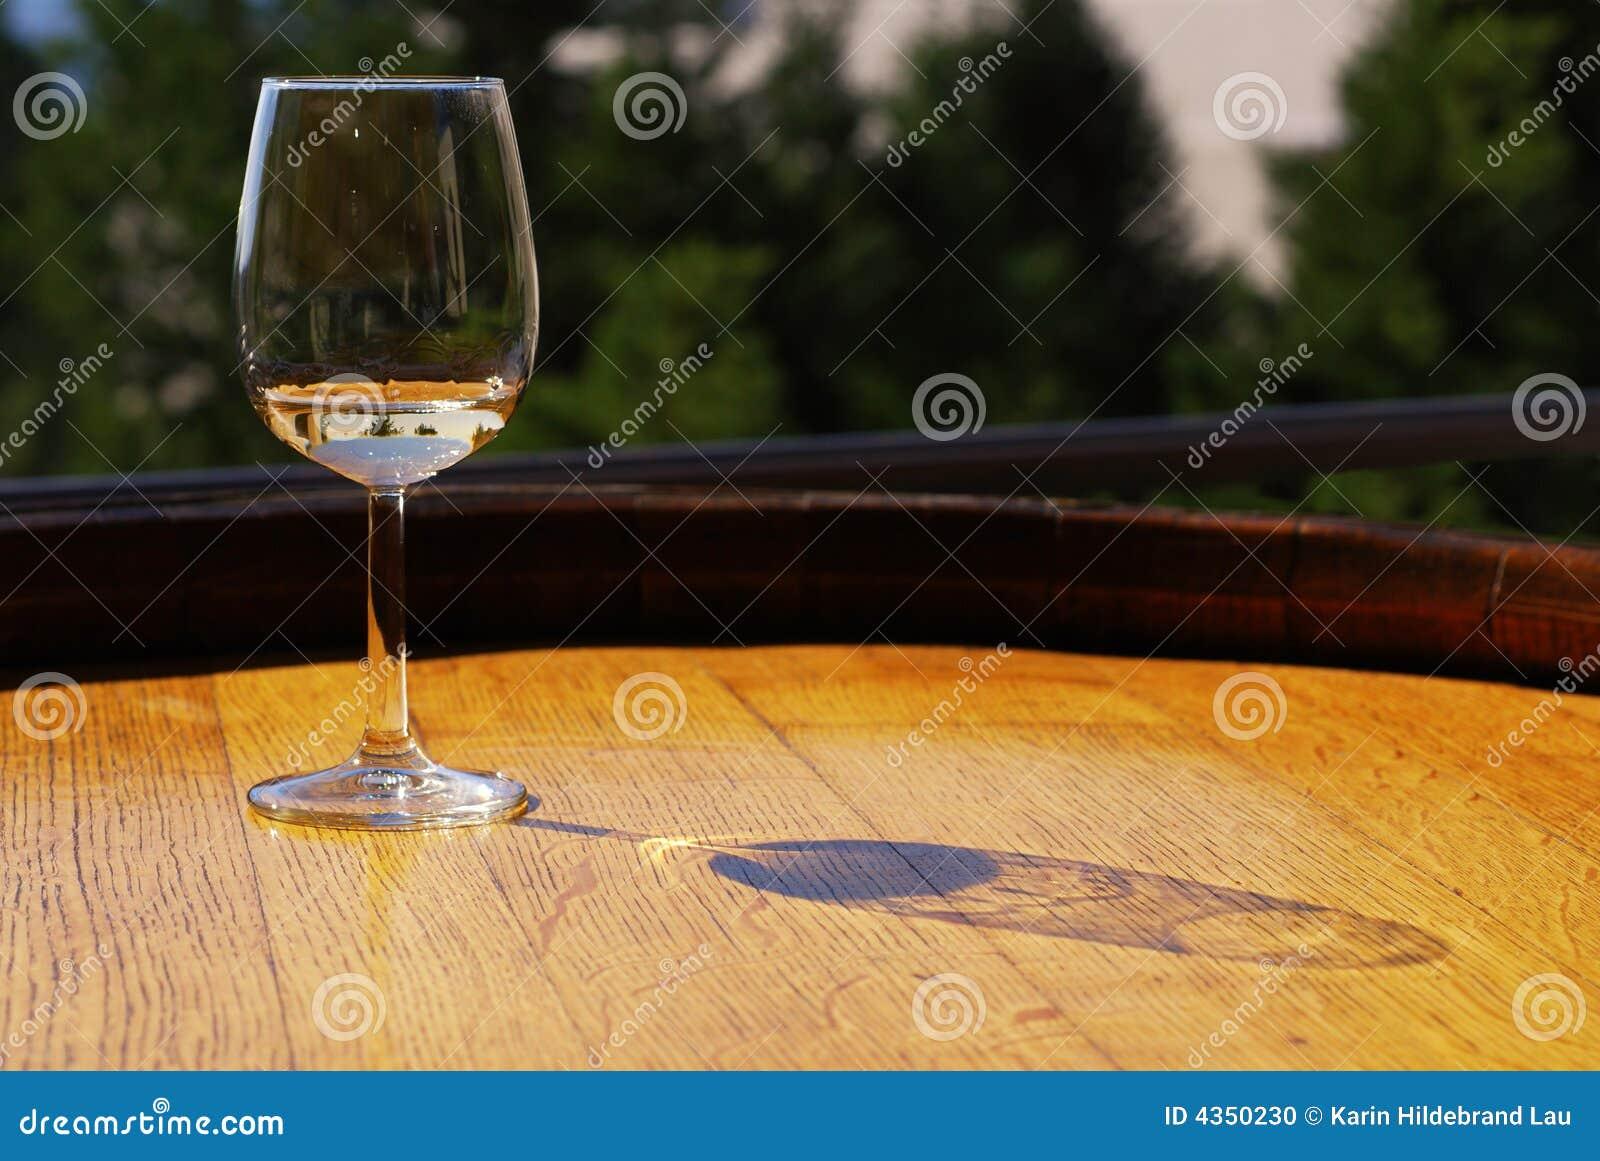 Vin de vin